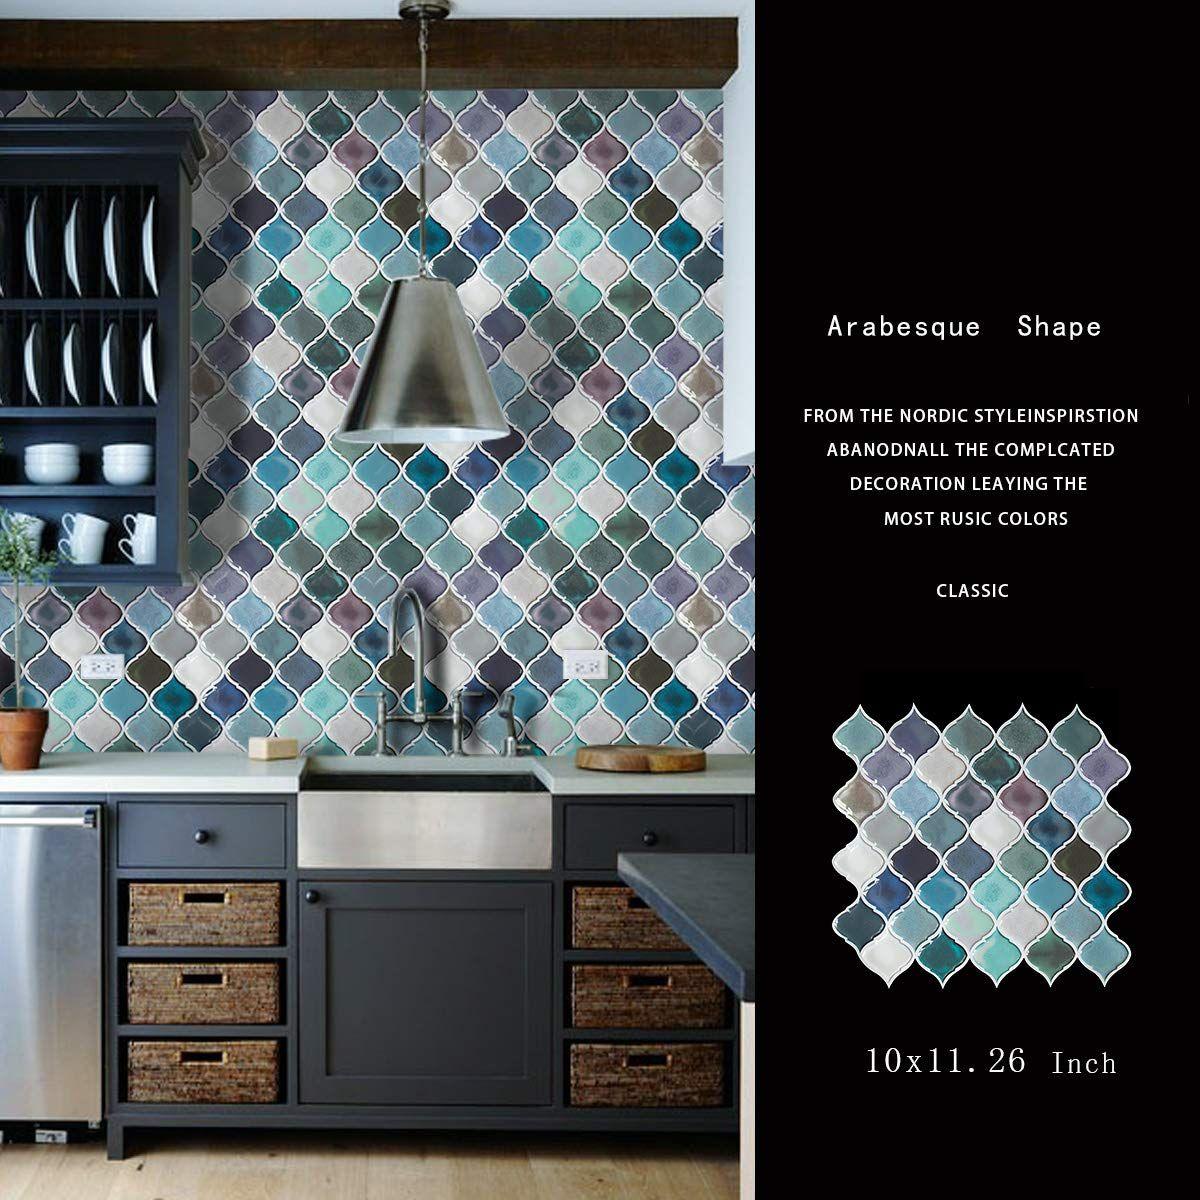 Turquoise Peel and Stick Tile Backsplash for Kitchen